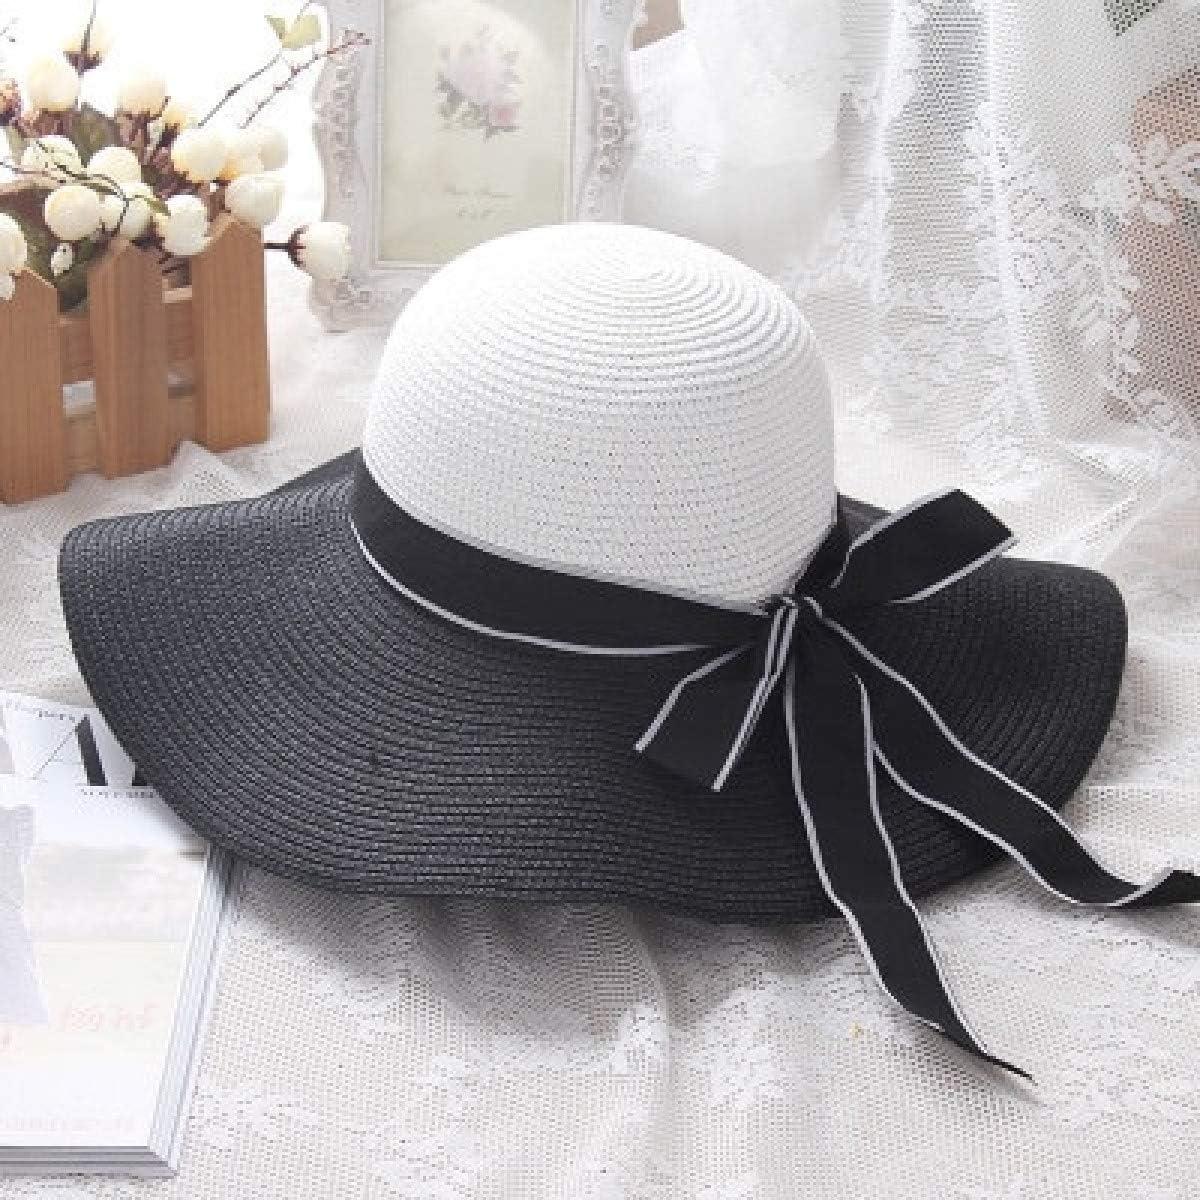 FLAMINGO/_STORE Wind Black White Striped Bowknot Summer Sun Hat Beautiful Women Straw Beach Hat Large Brimmed Hat